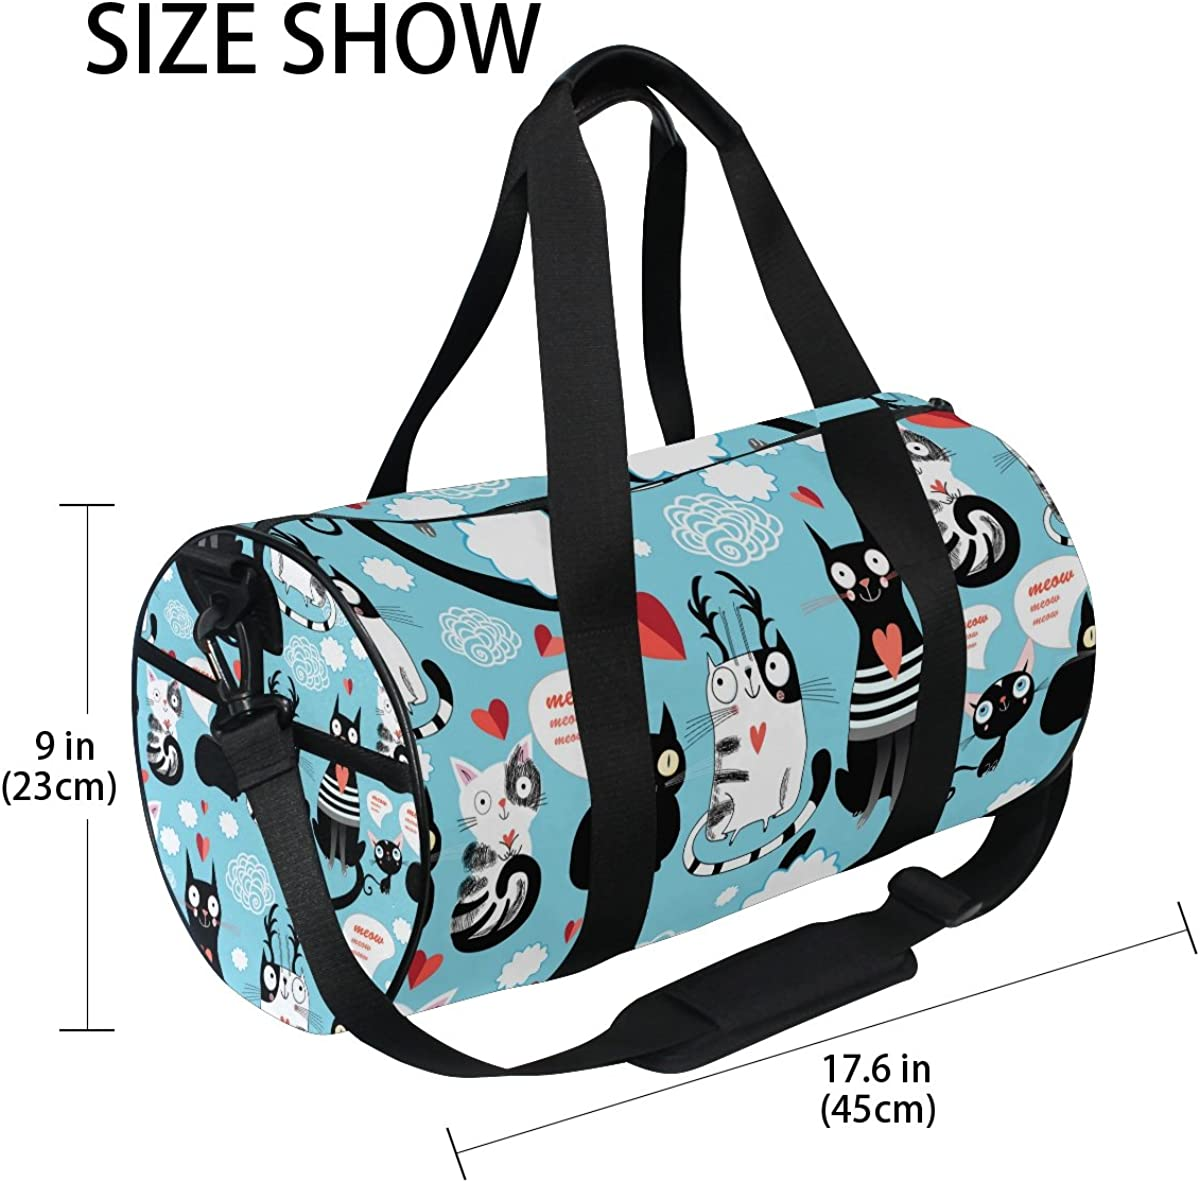 Evolutions Blue Dog Cat Paw Travel Duffel Bag Sports Gym Bag For Men /& Women